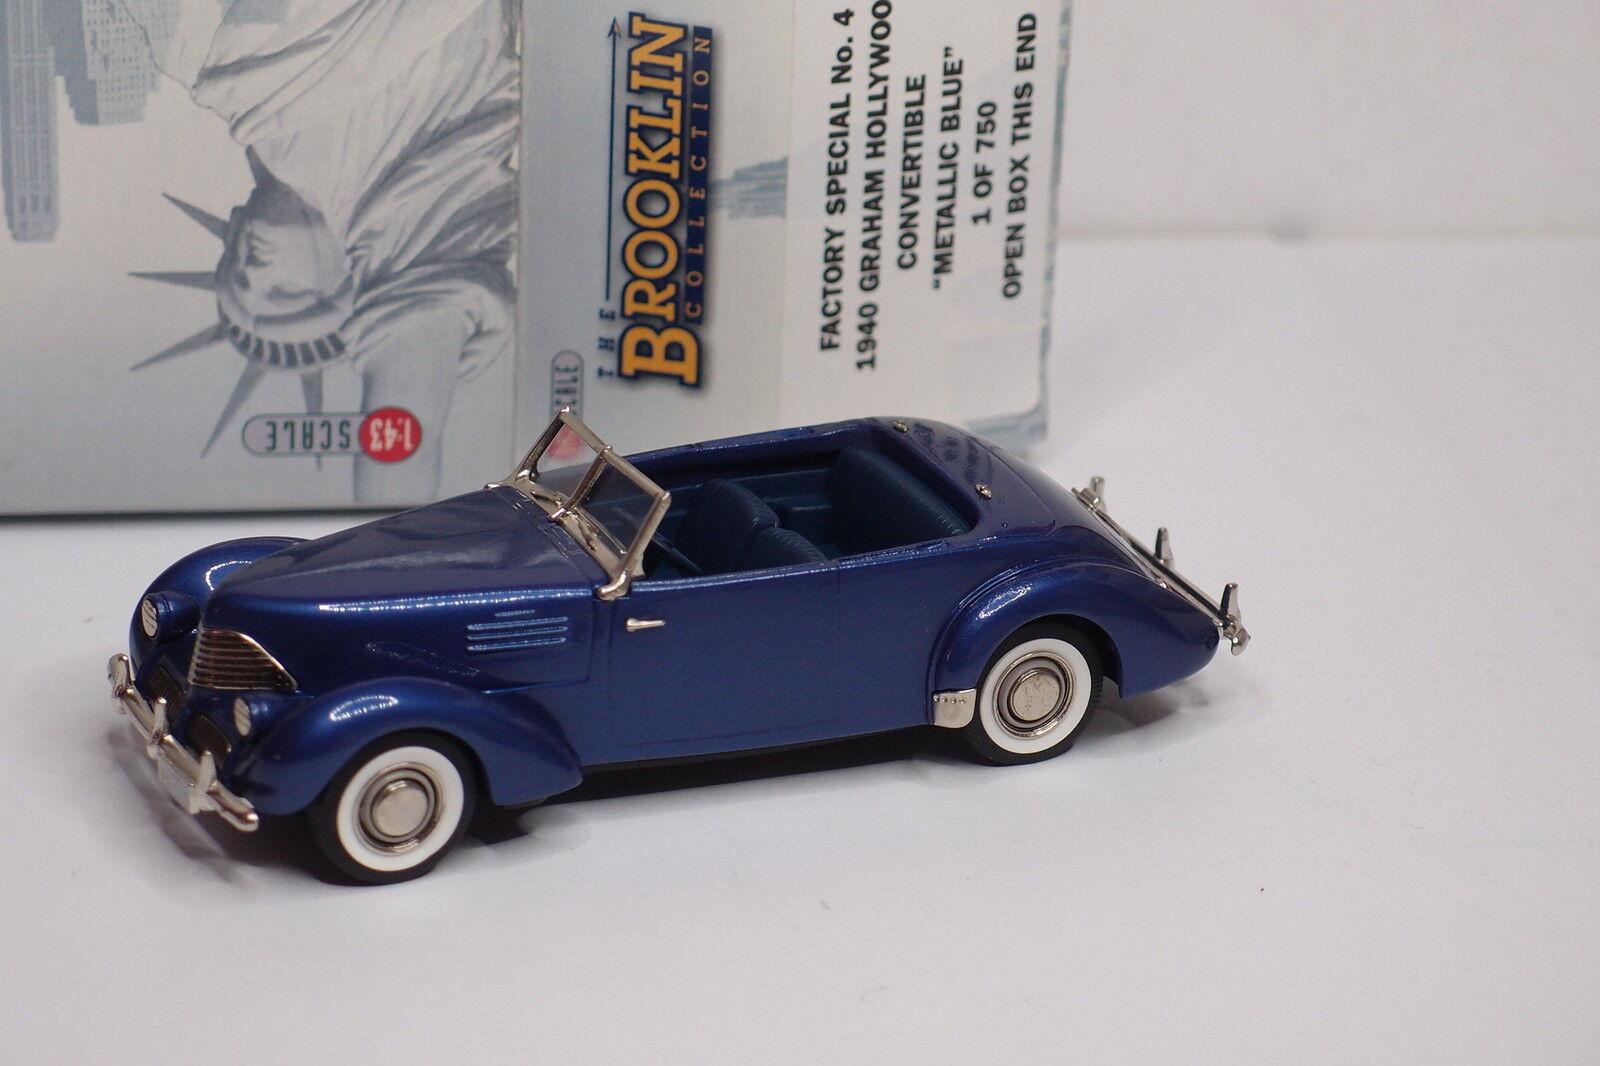 Brooklin fabrik besondere   4 1940 graham hollywood - cabrio - Blau 1     43